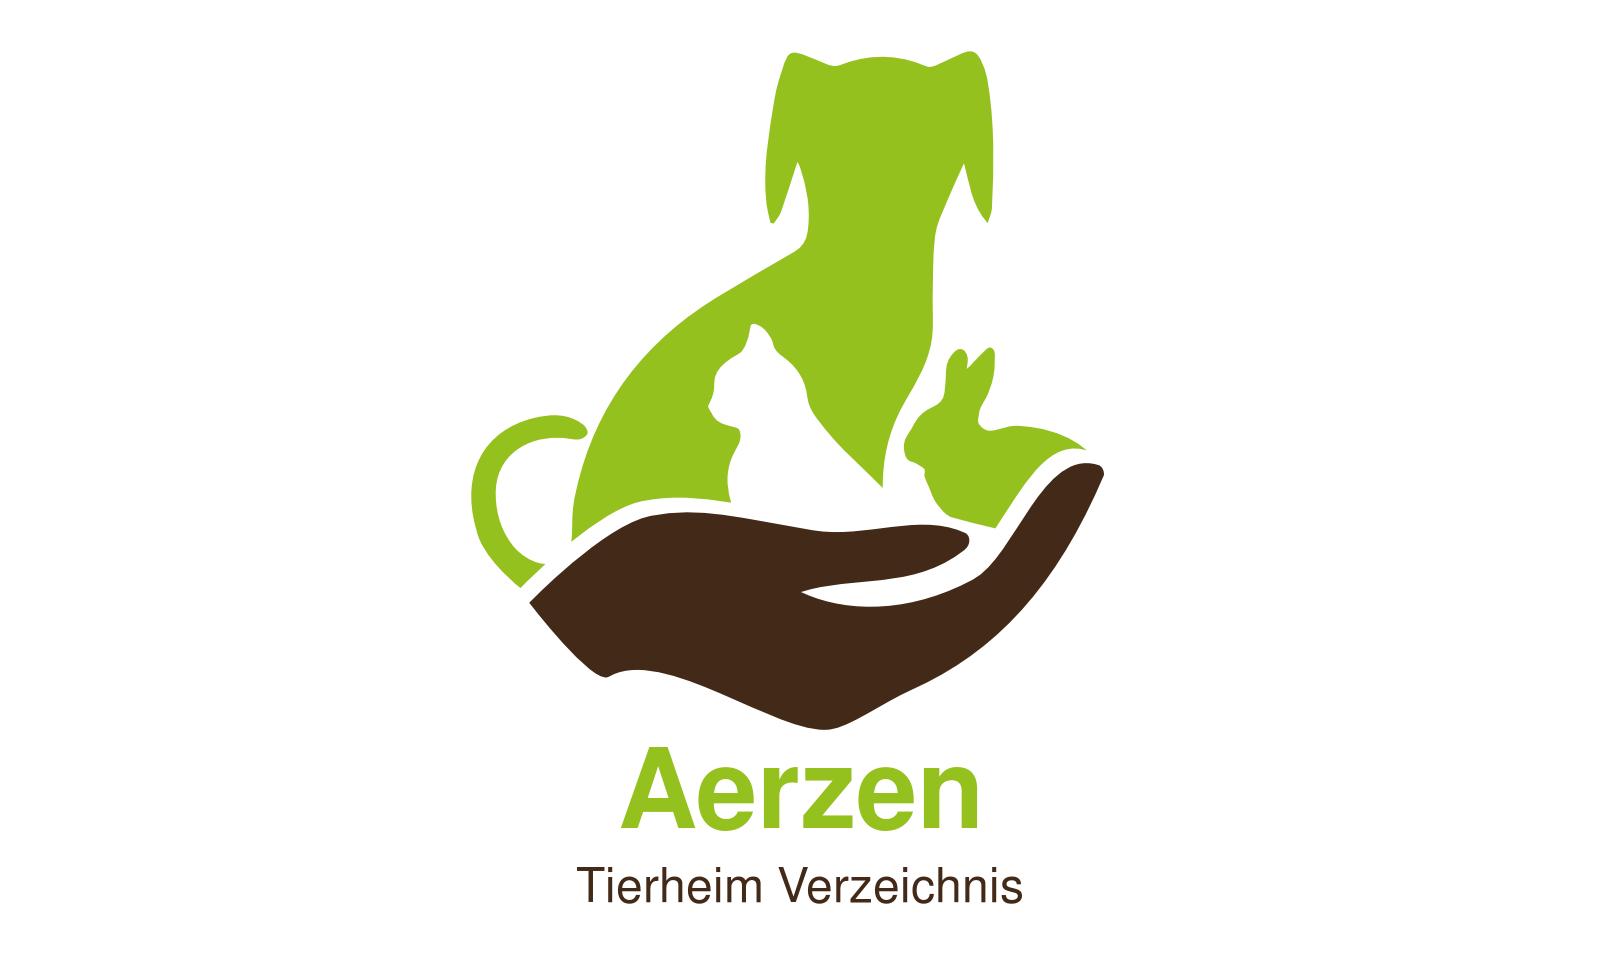 Tierheim Aerzen